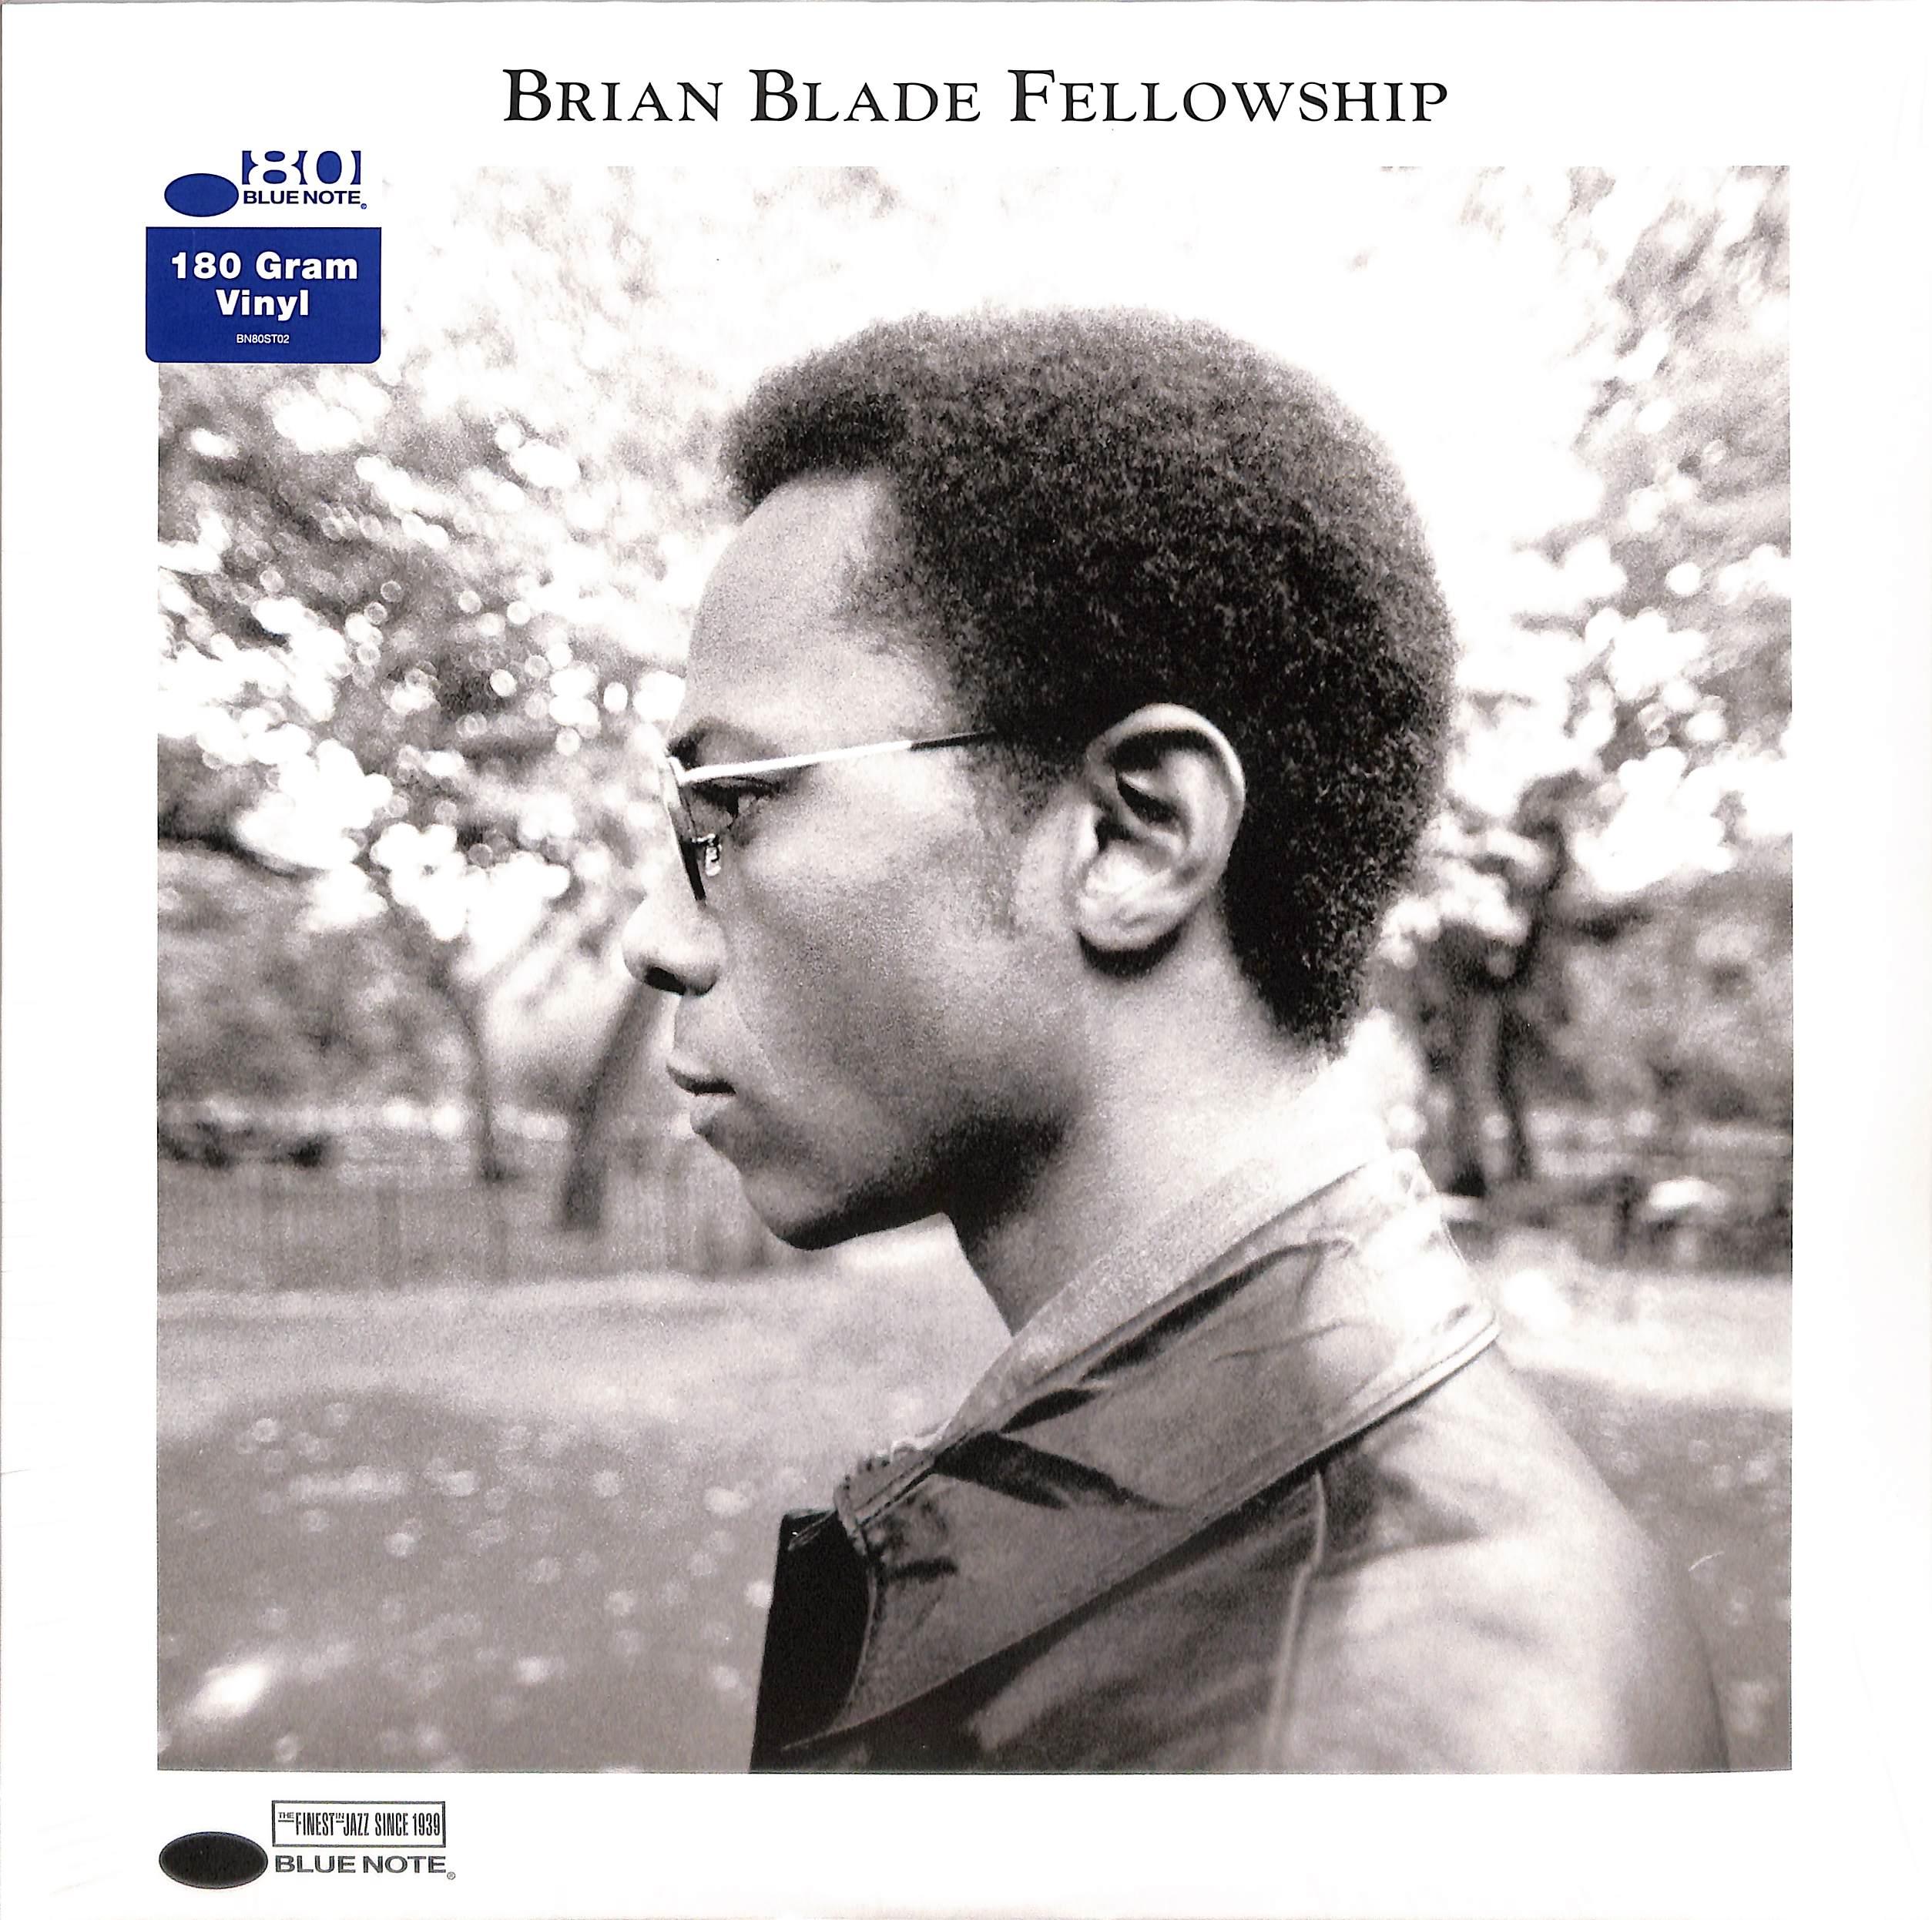 Brian Blade Fellowship - BRIAN BLADE FELLOWSHIP